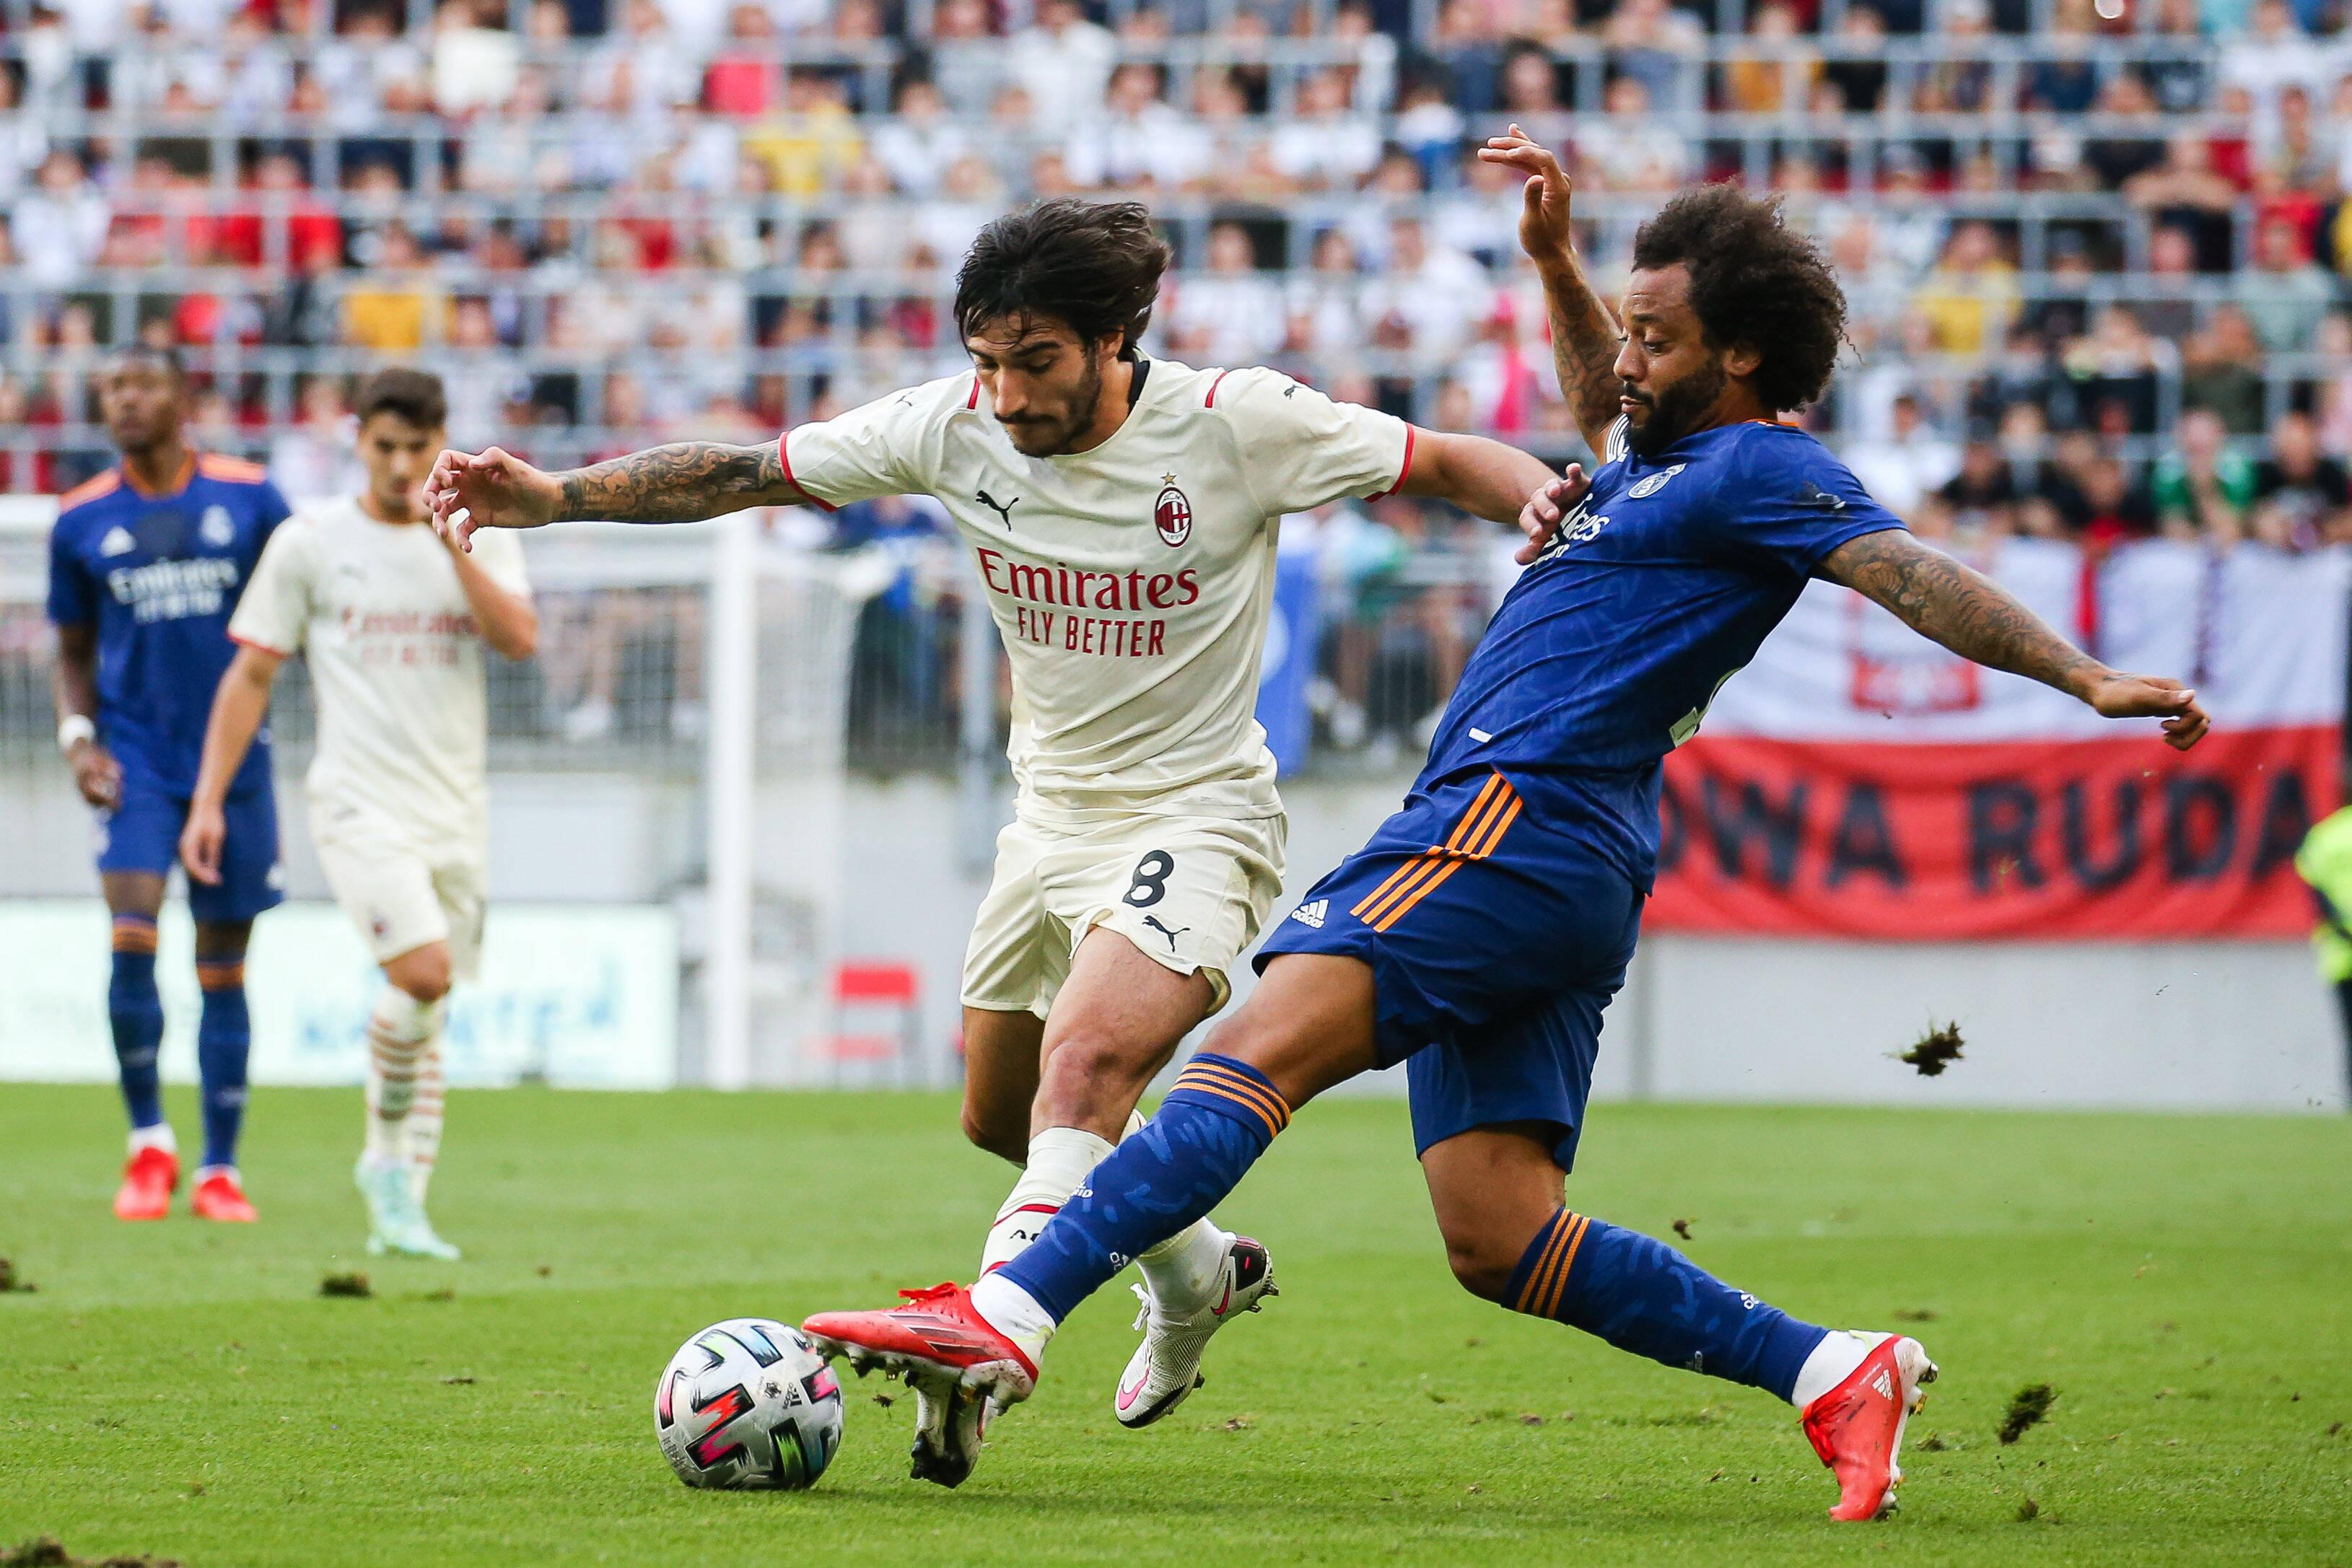 Real Madrid draw with AC Milan in final preseason clash